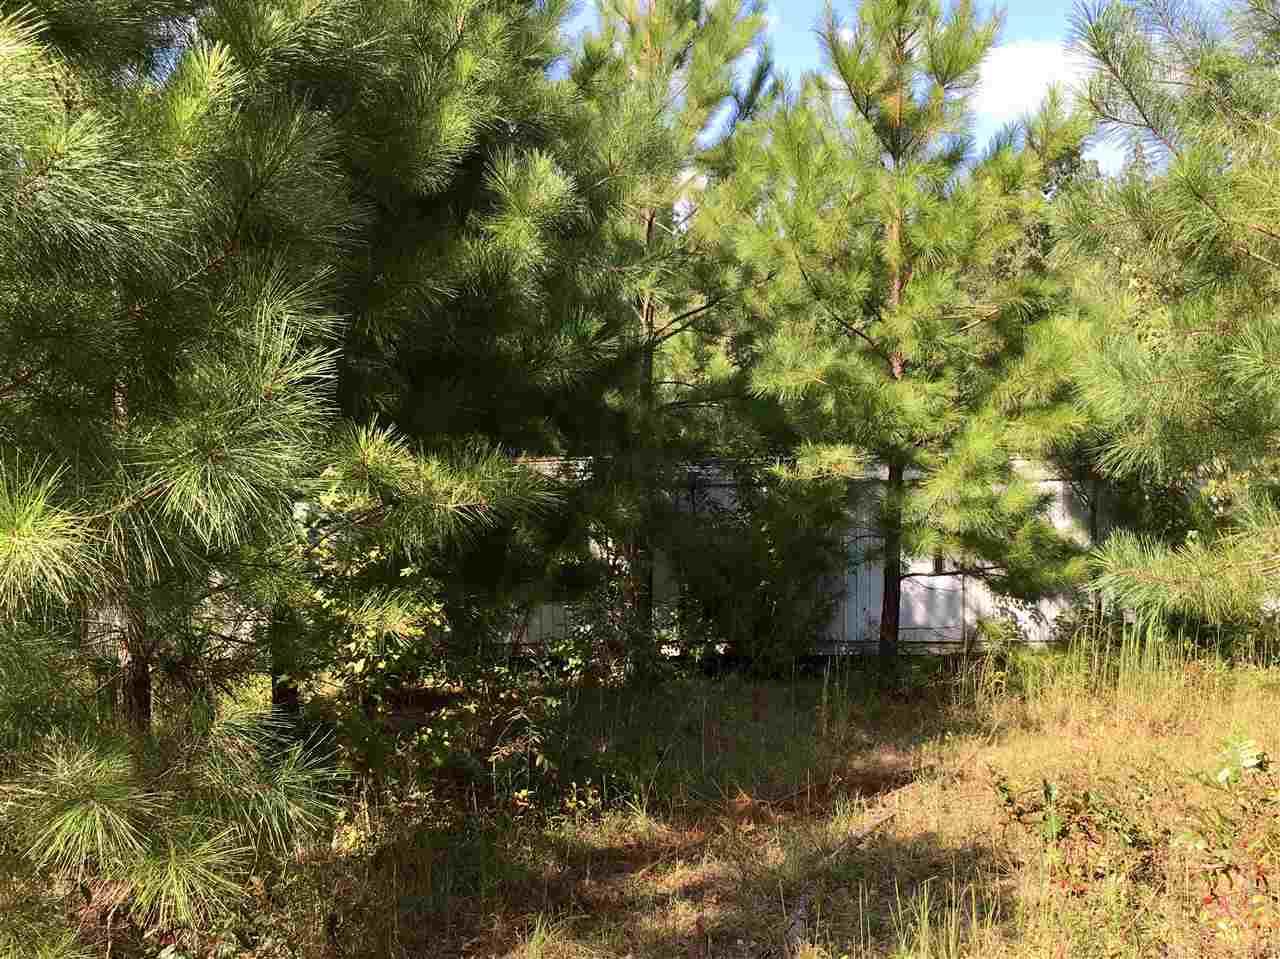 Five Forks Saltillo, TN 38370 - MLS #: 10011279